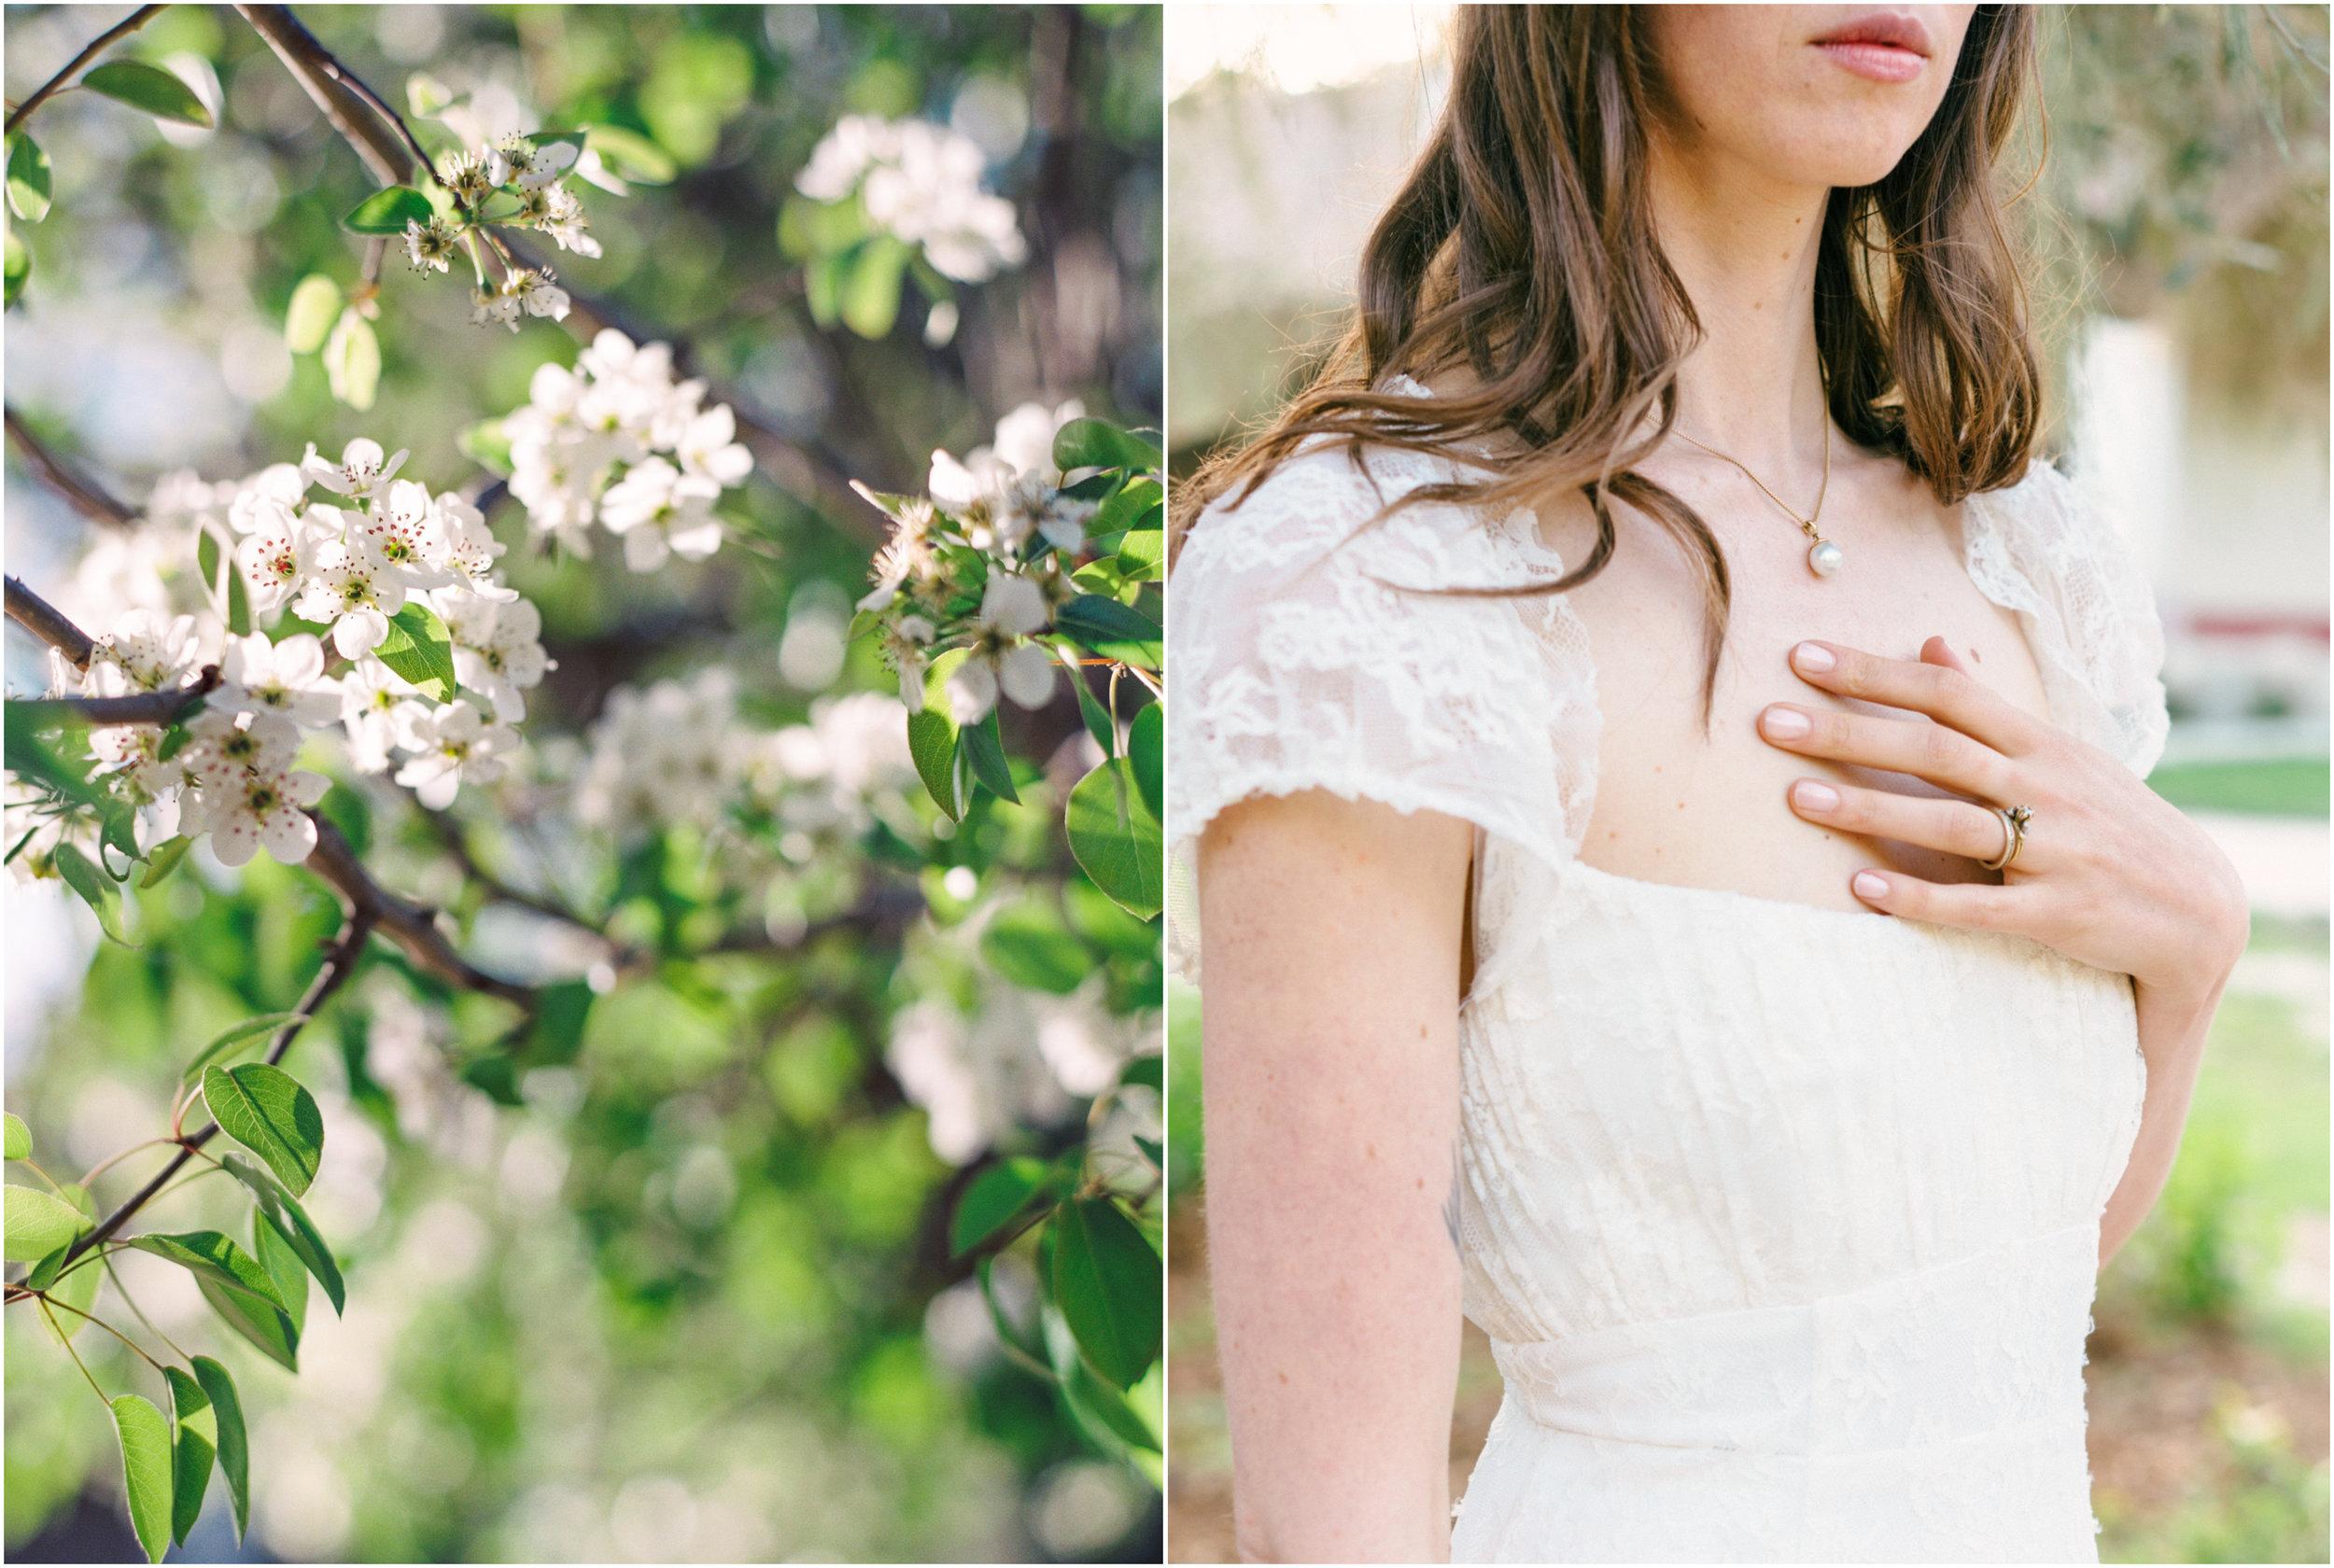 San_Francisco_Wedding_Photographer_Pinnel_Photography_La_Purisima-2.jpg